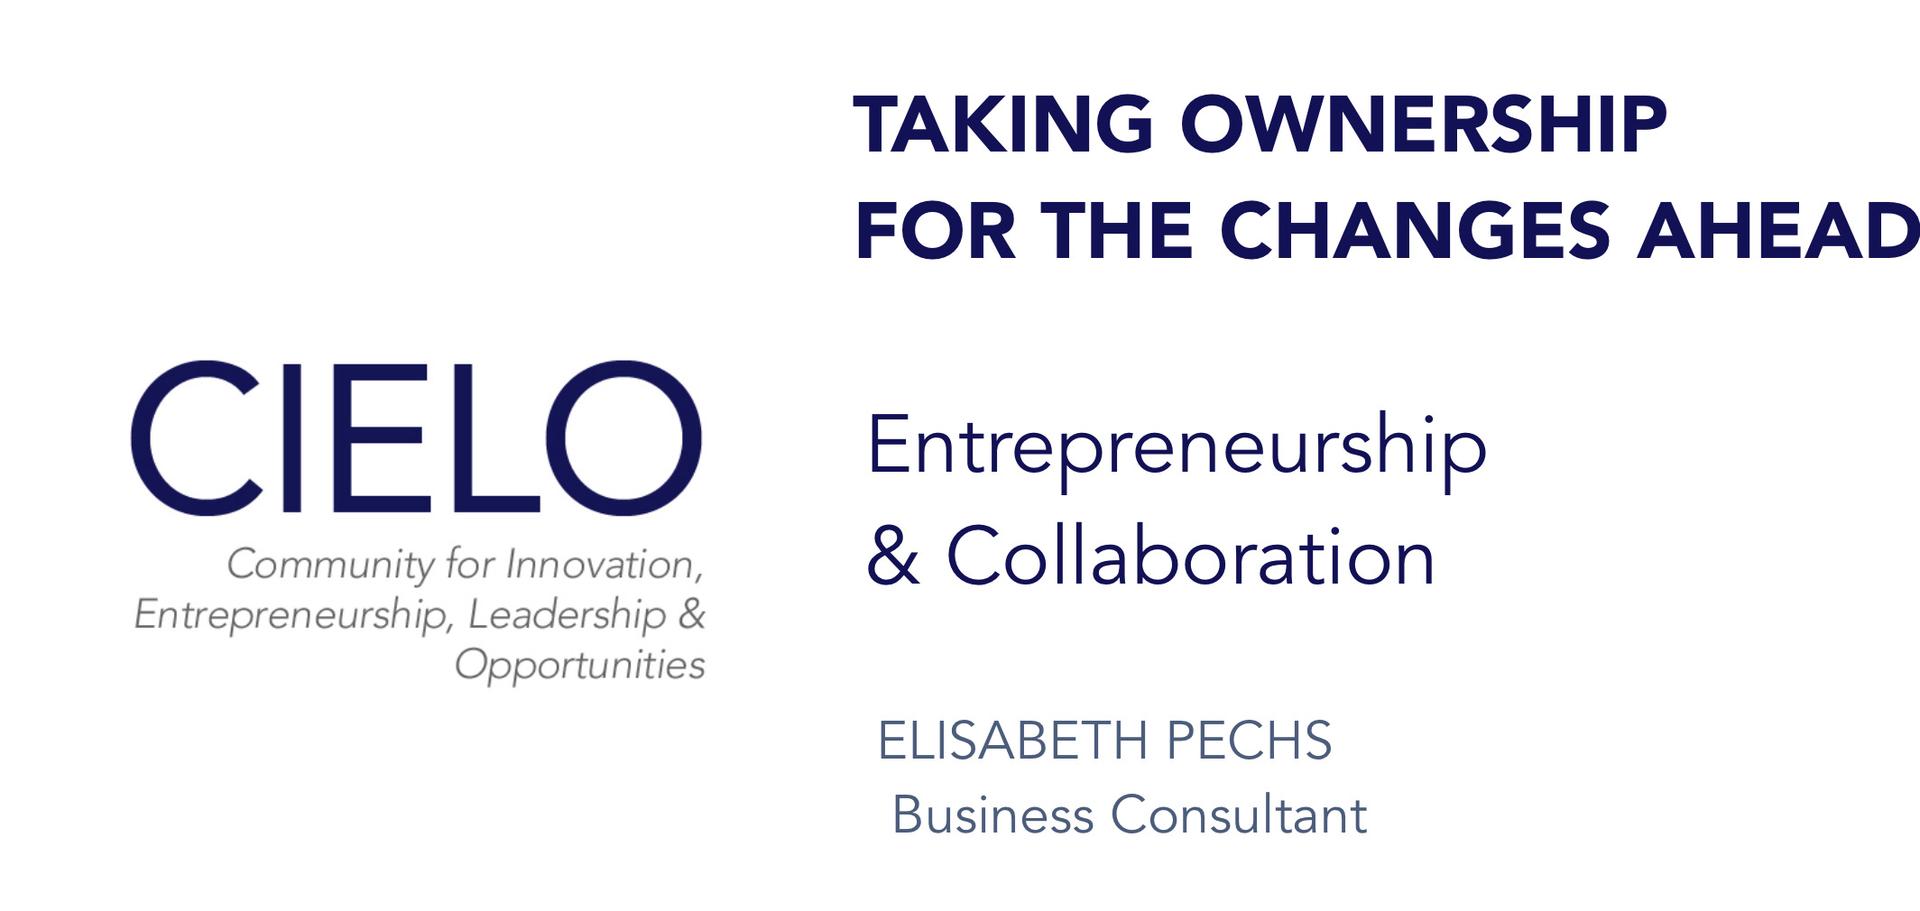 CIELO (Community for Innovation, Entrepreneurship, Leadership and Opportunities